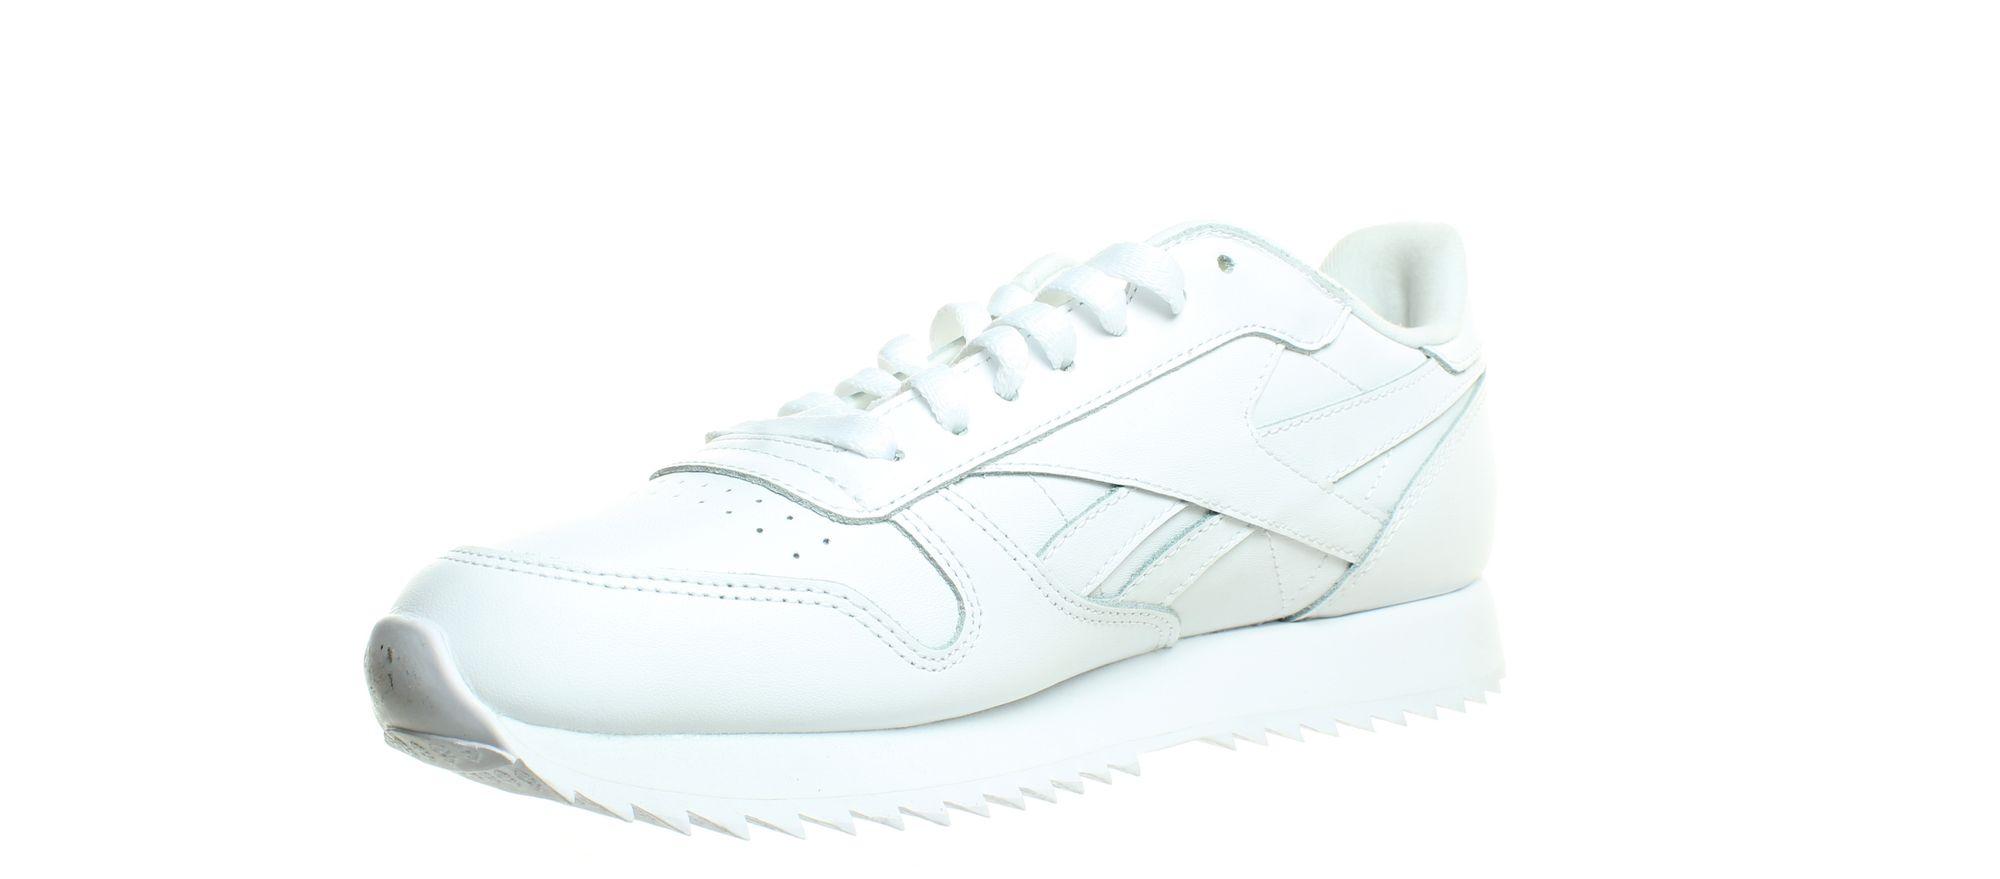 Reebok-Mens-Classic-Leather-Ripple-Fashion-Sneakers thumbnail 23